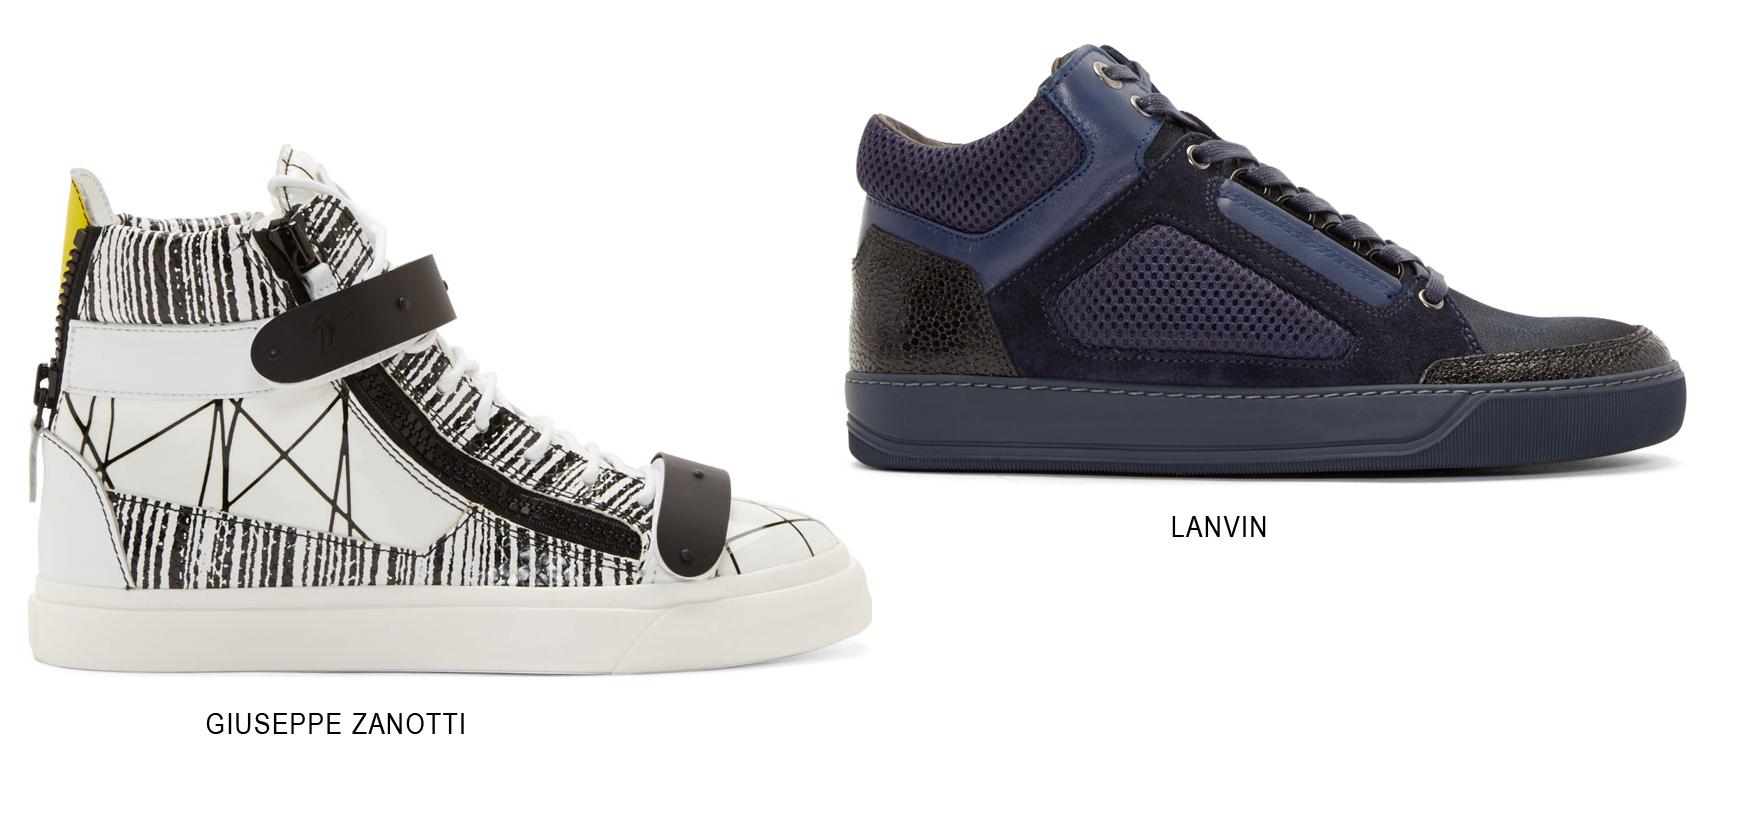 arty-giuseppe-zanotti-lanvin-sneakers